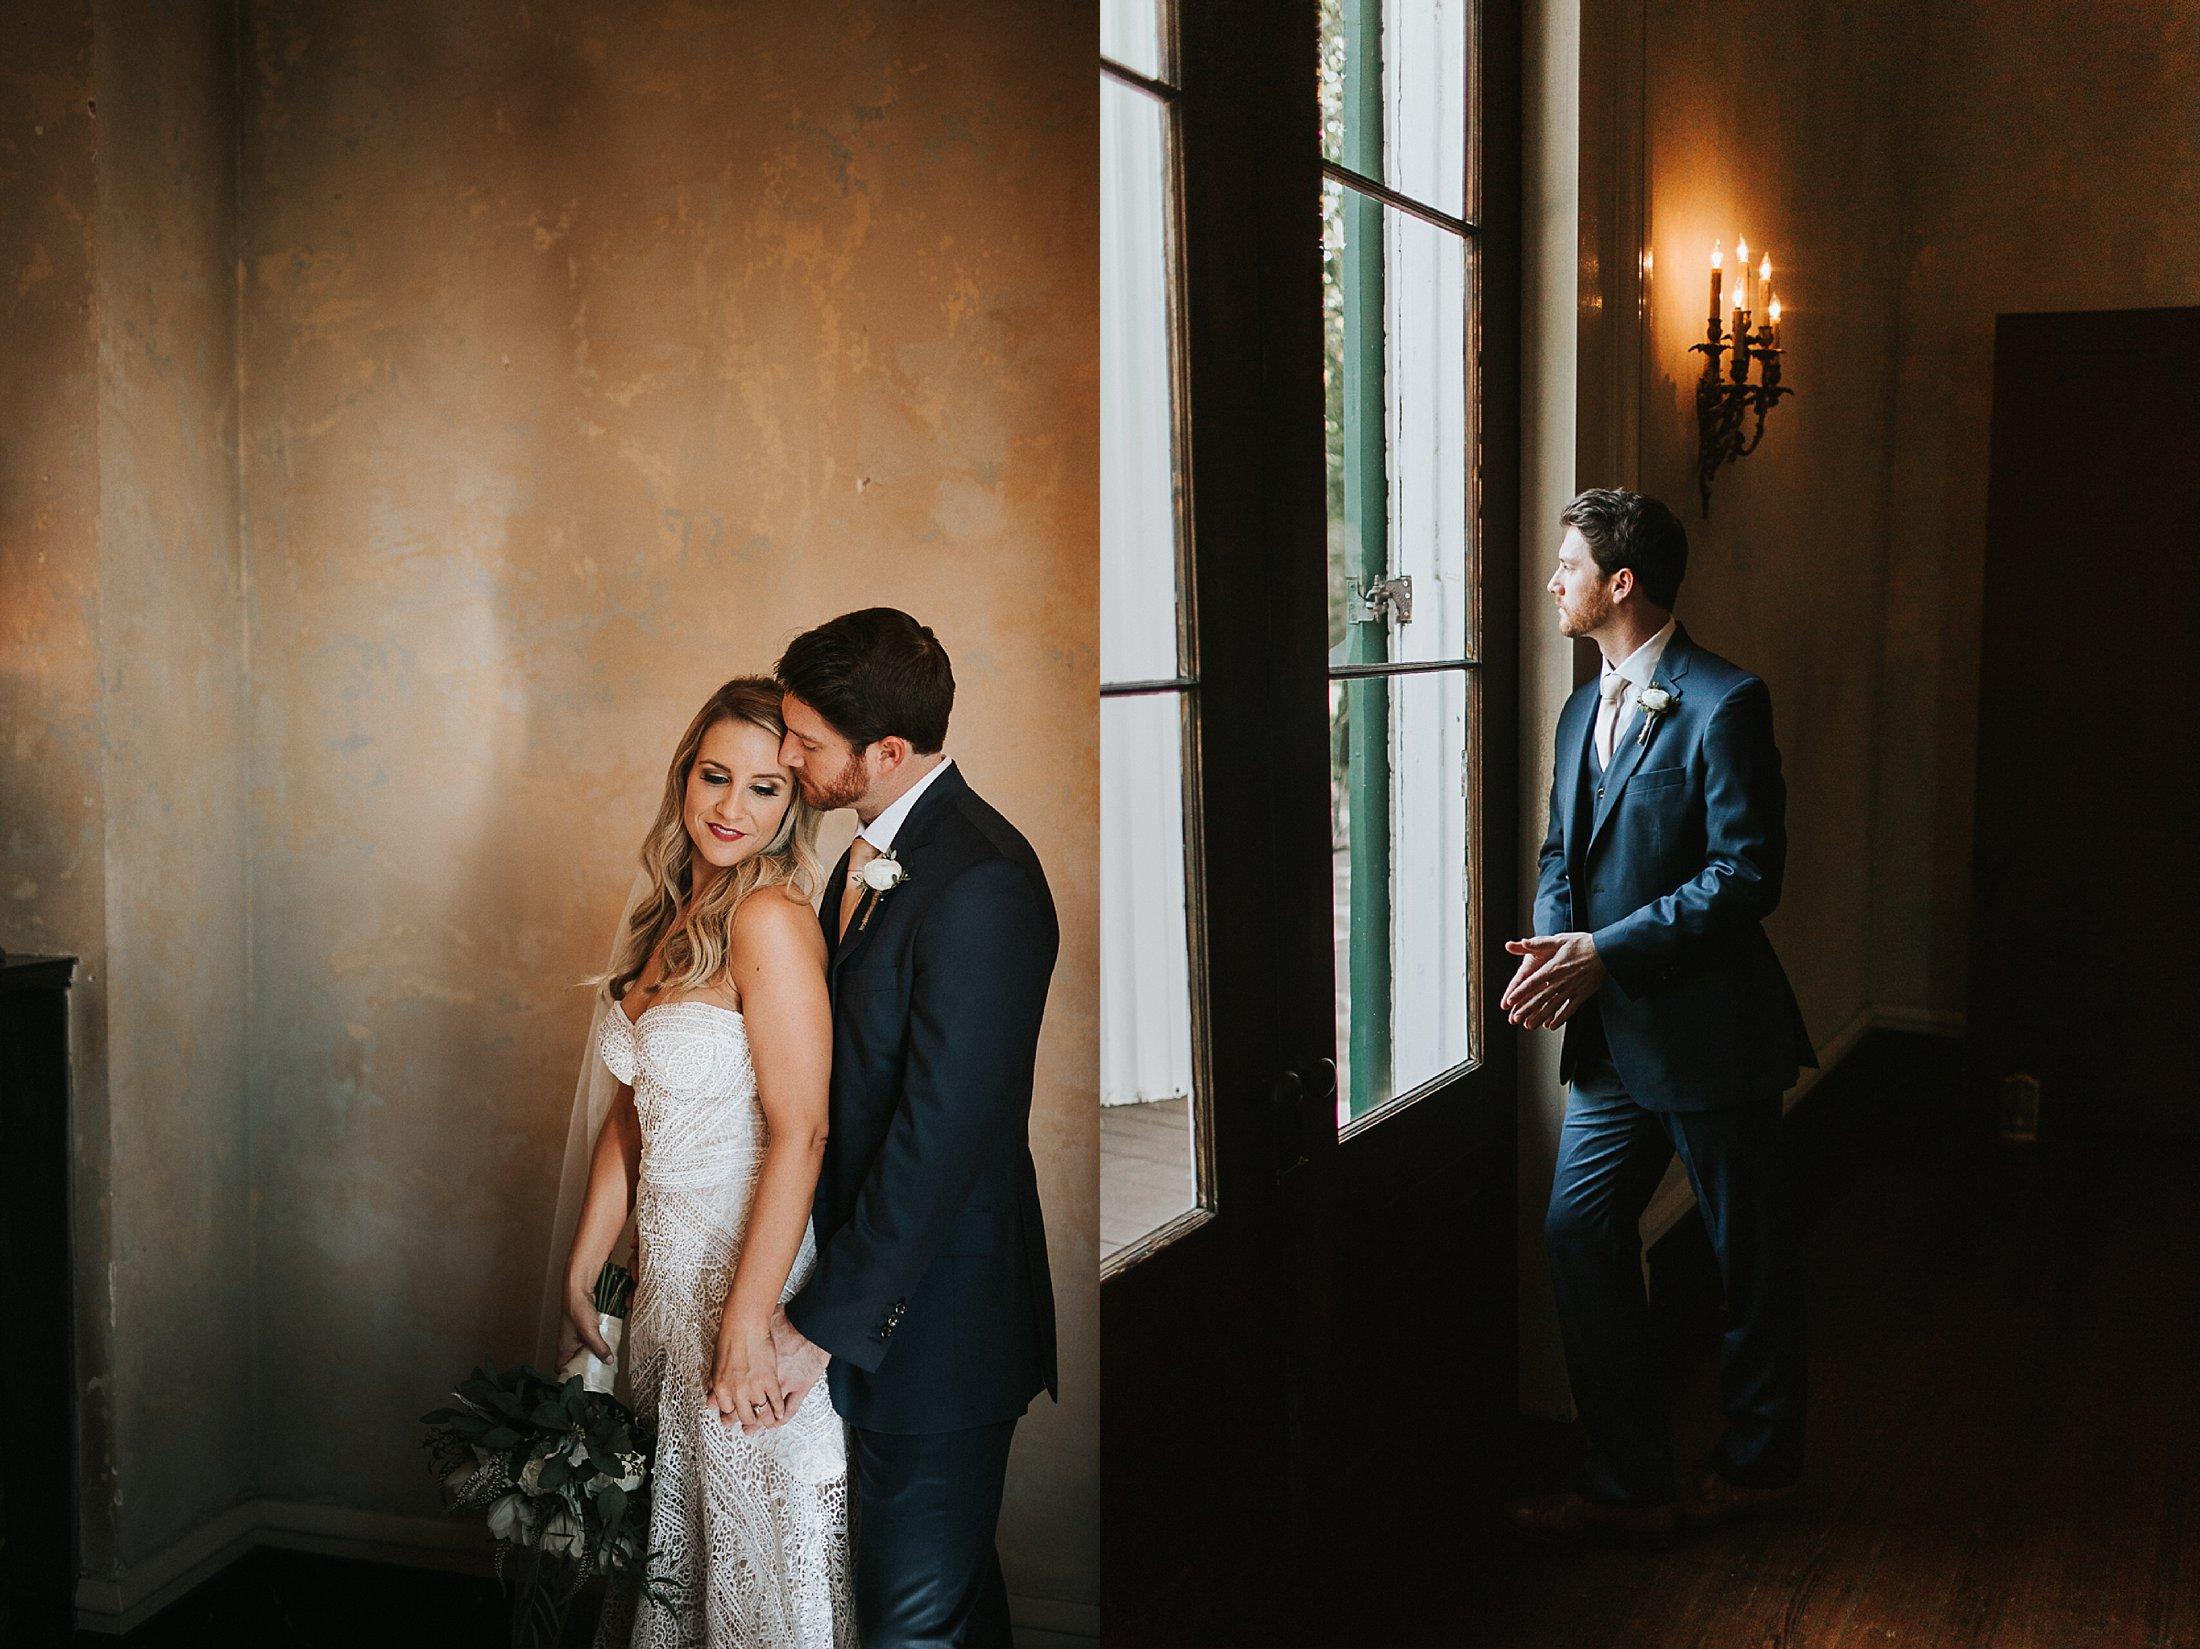 best-wedding-photographers-nashville-tn-18.jpg